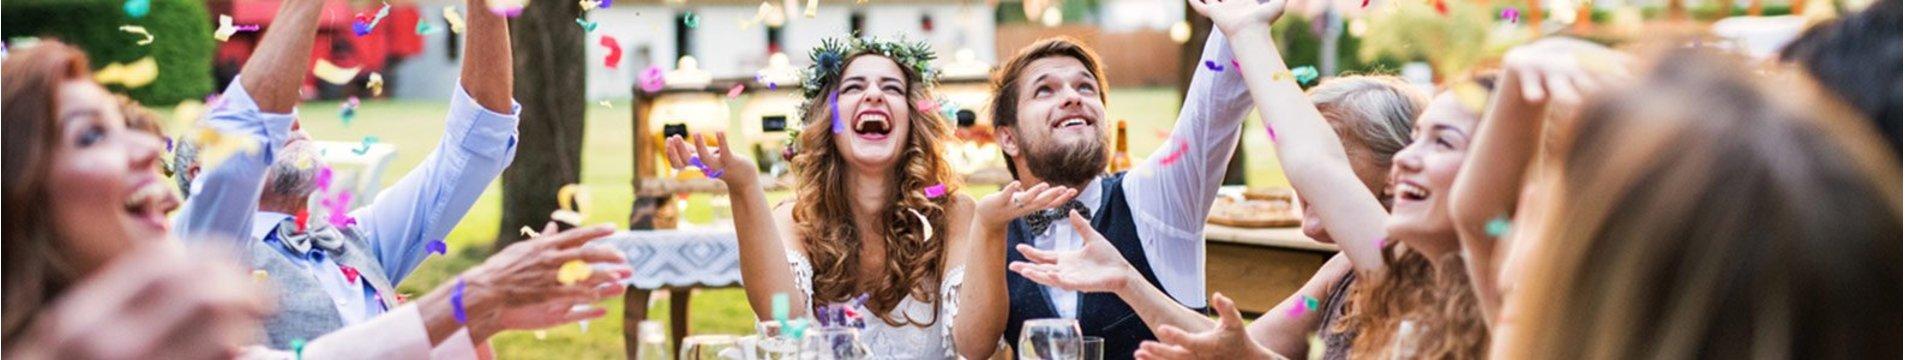 bridesman-and-groomgirls-thumb.jpg